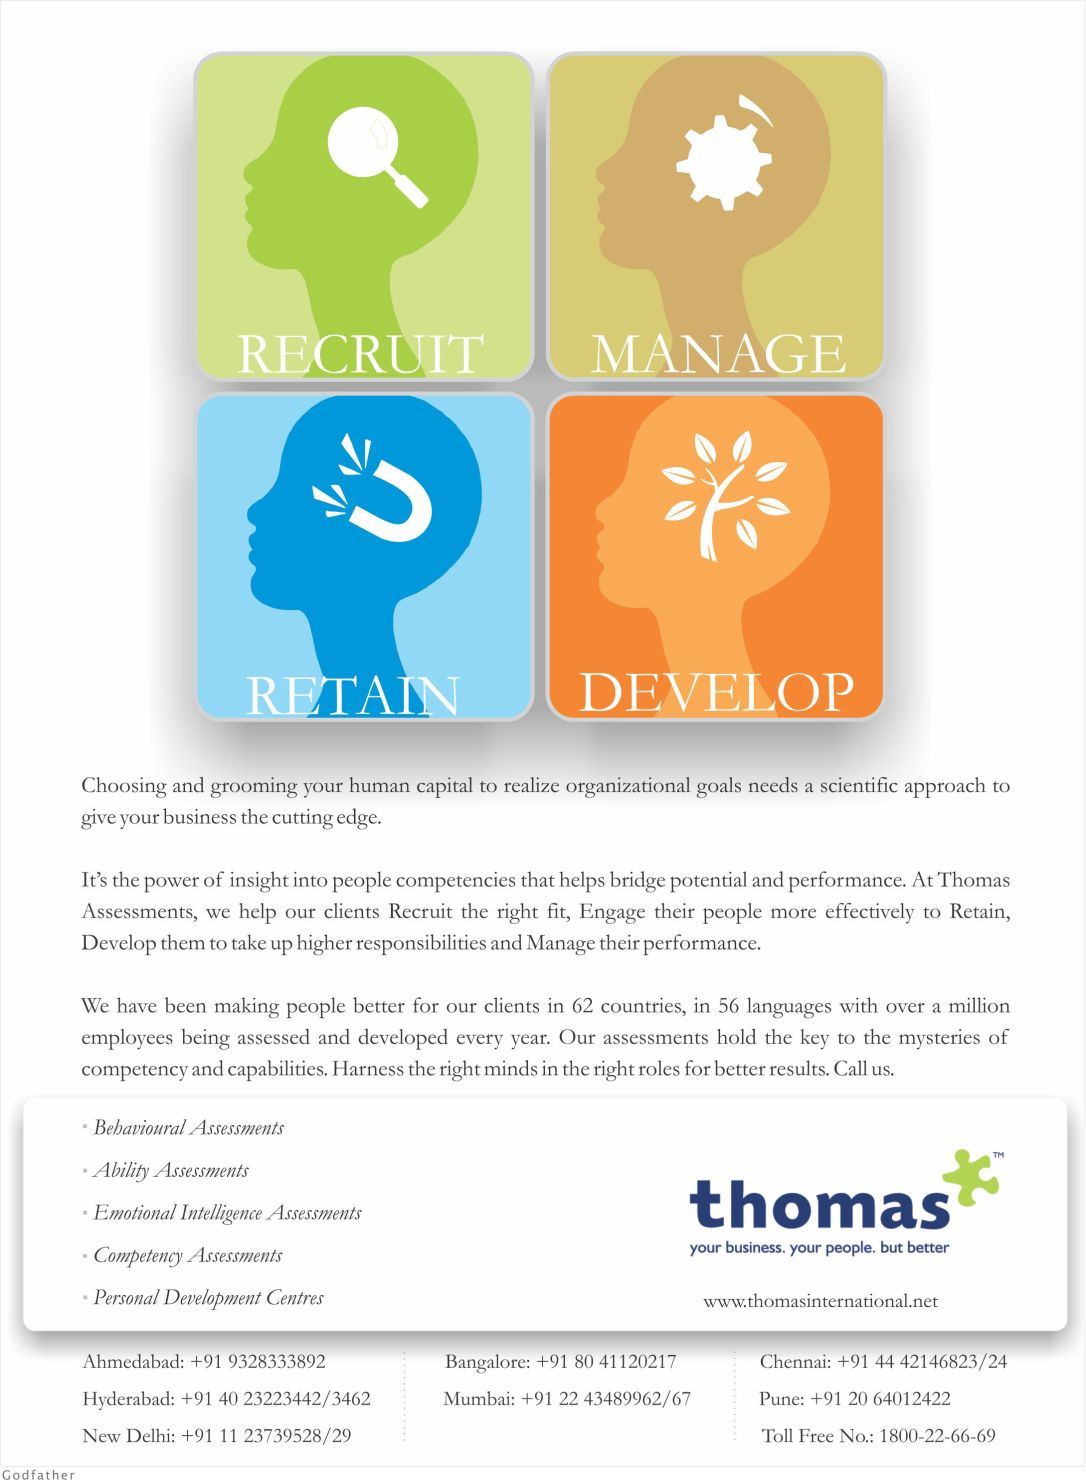 Thomas Ad for Dec2012 main issue